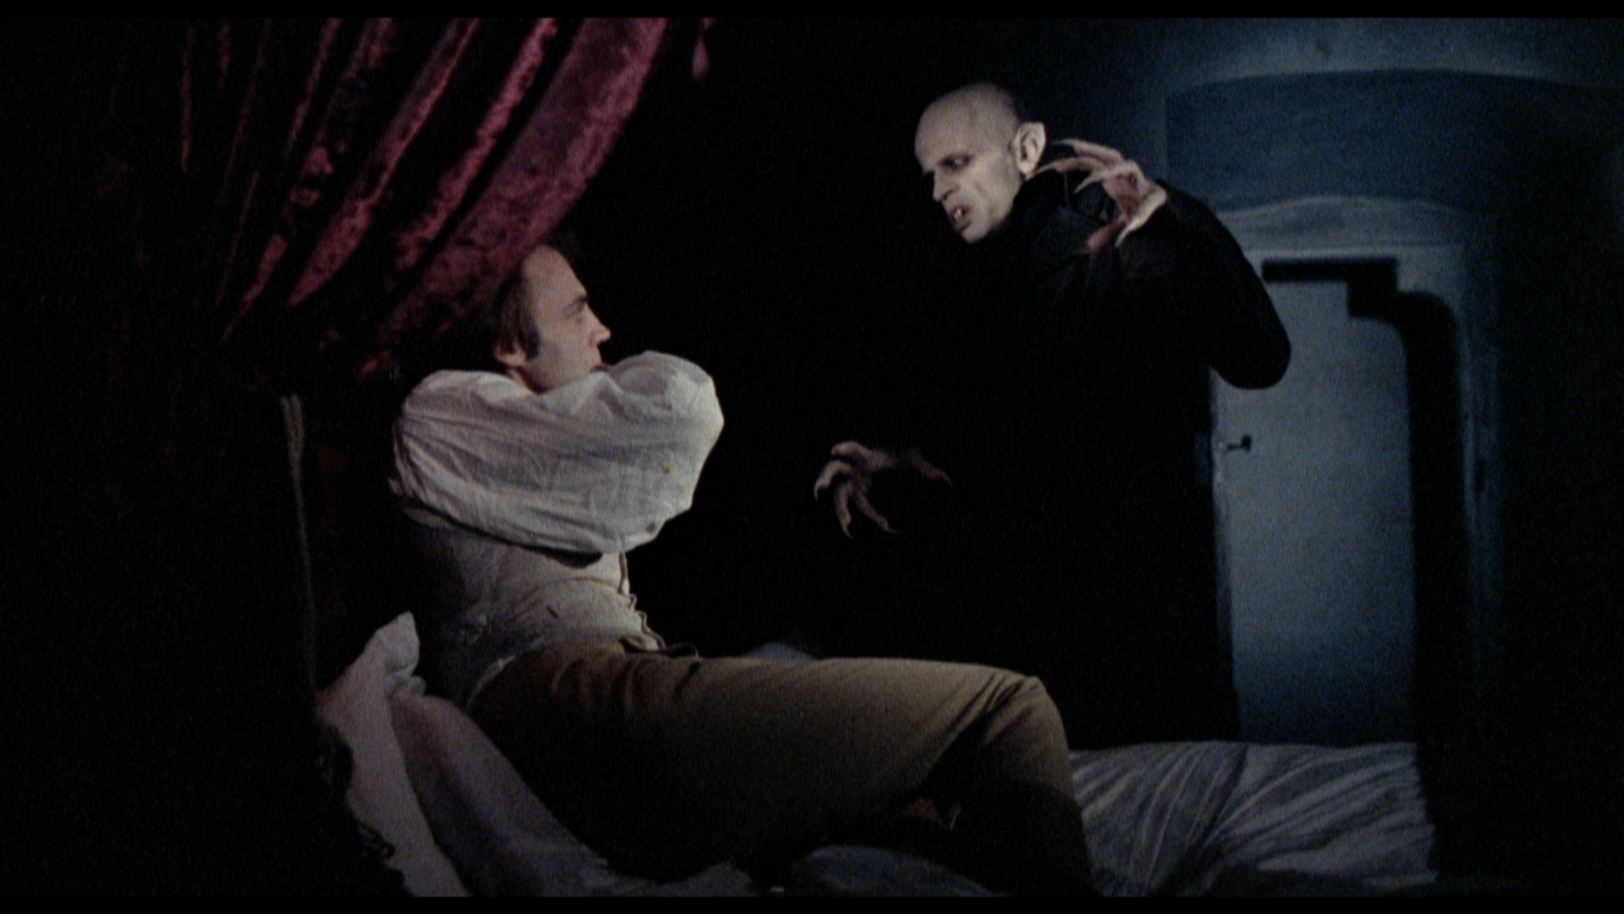 nosferatu essay Nosferatu nosferatu based on the film by f w murnau nasfer2 (dracula)   after the atlantic piece, his essays and poetry received national acclaim.